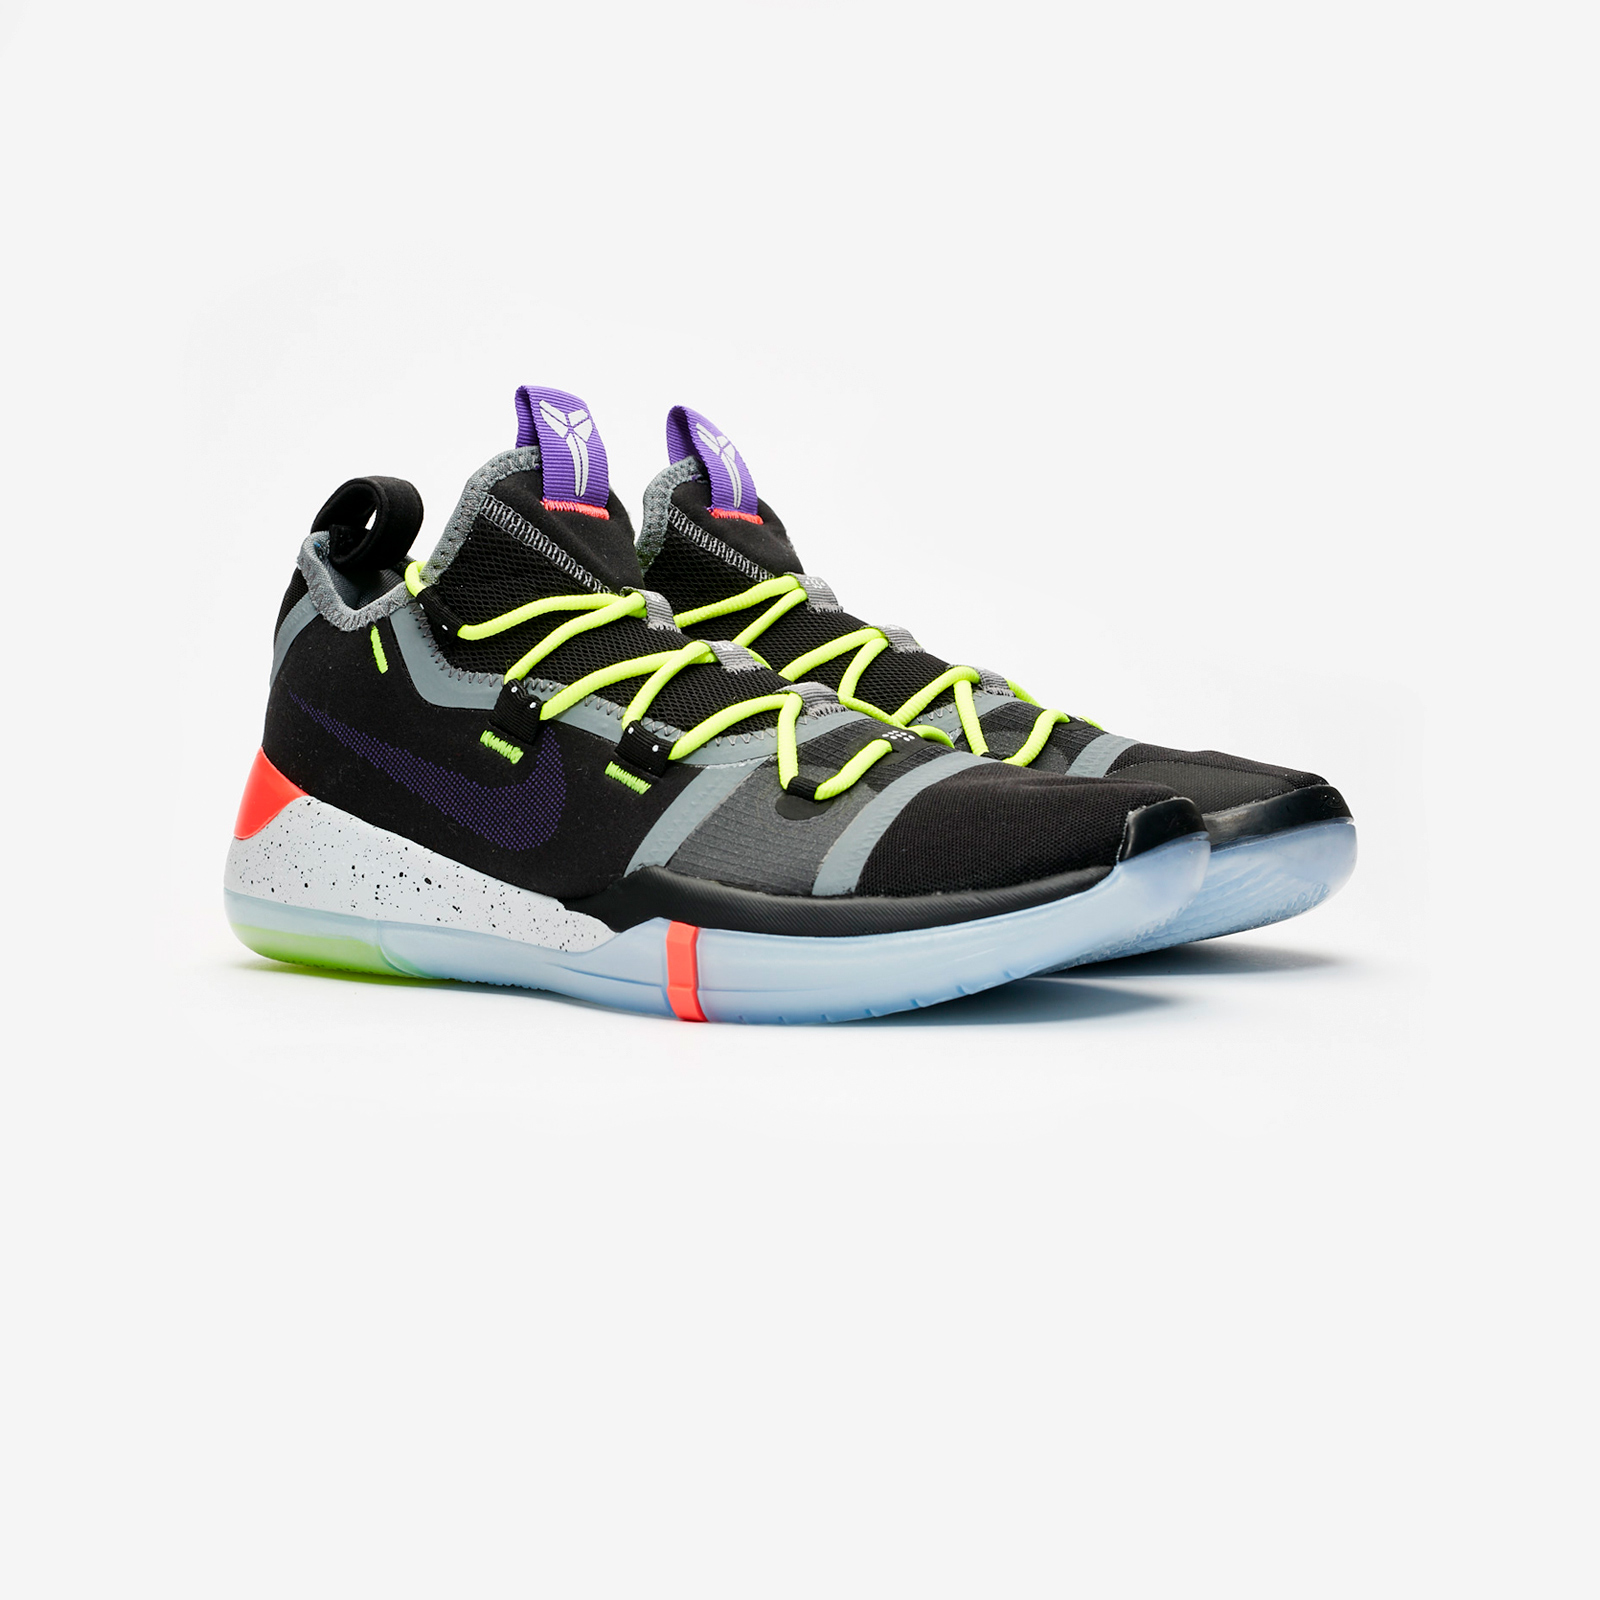 Nike Kobe AD - Av3555-003